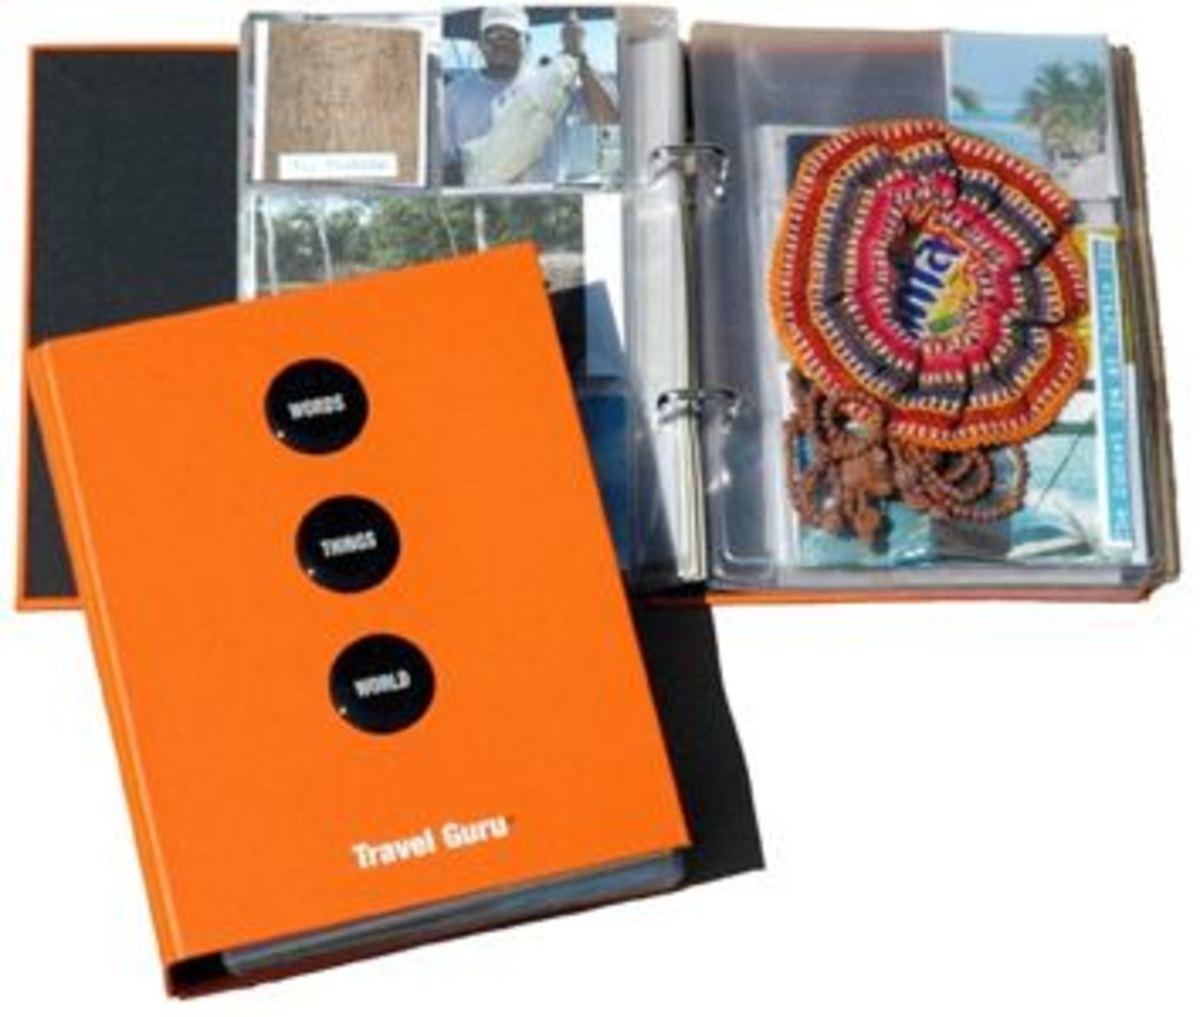 travelmembook